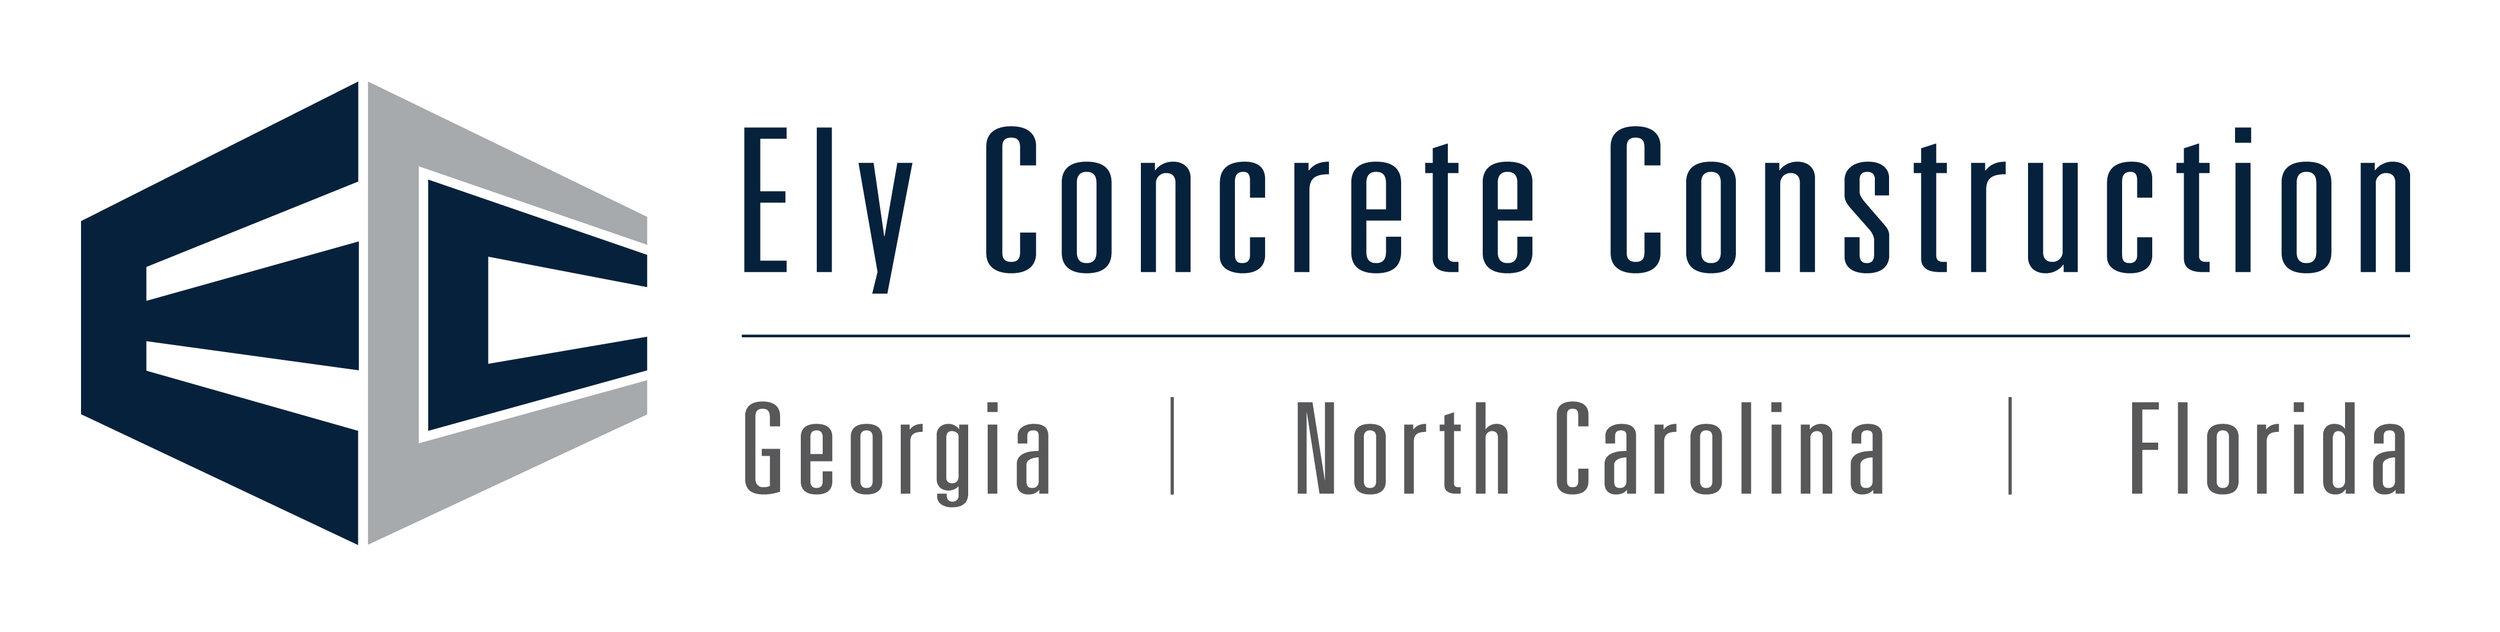 Ely_Concrete-Logo.jpg